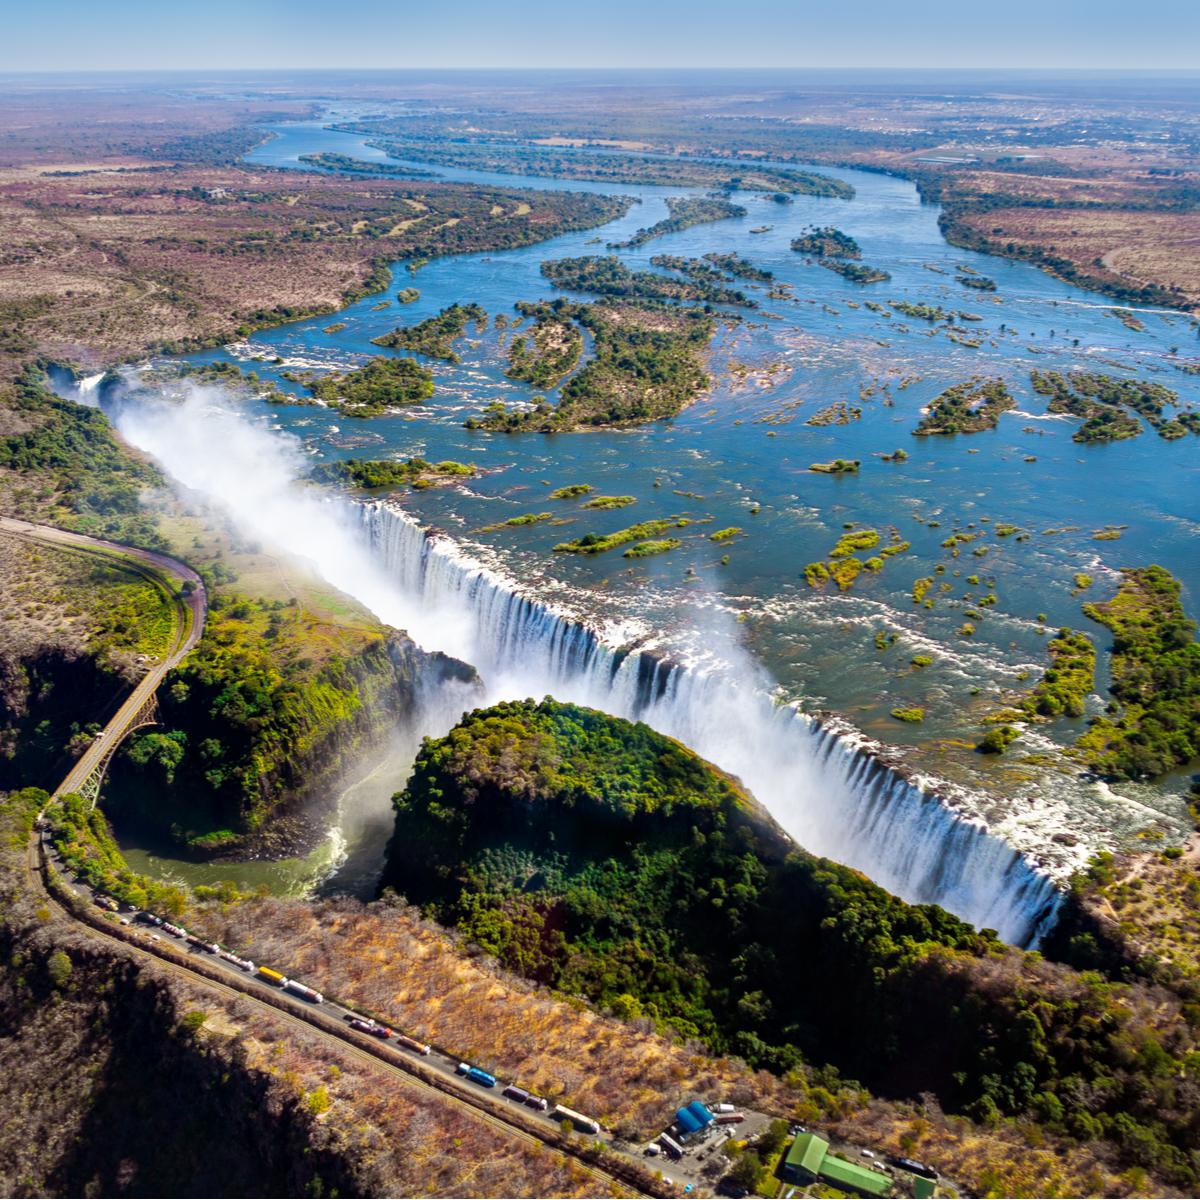 Victoria Falls between Zambia and Zimbabwe